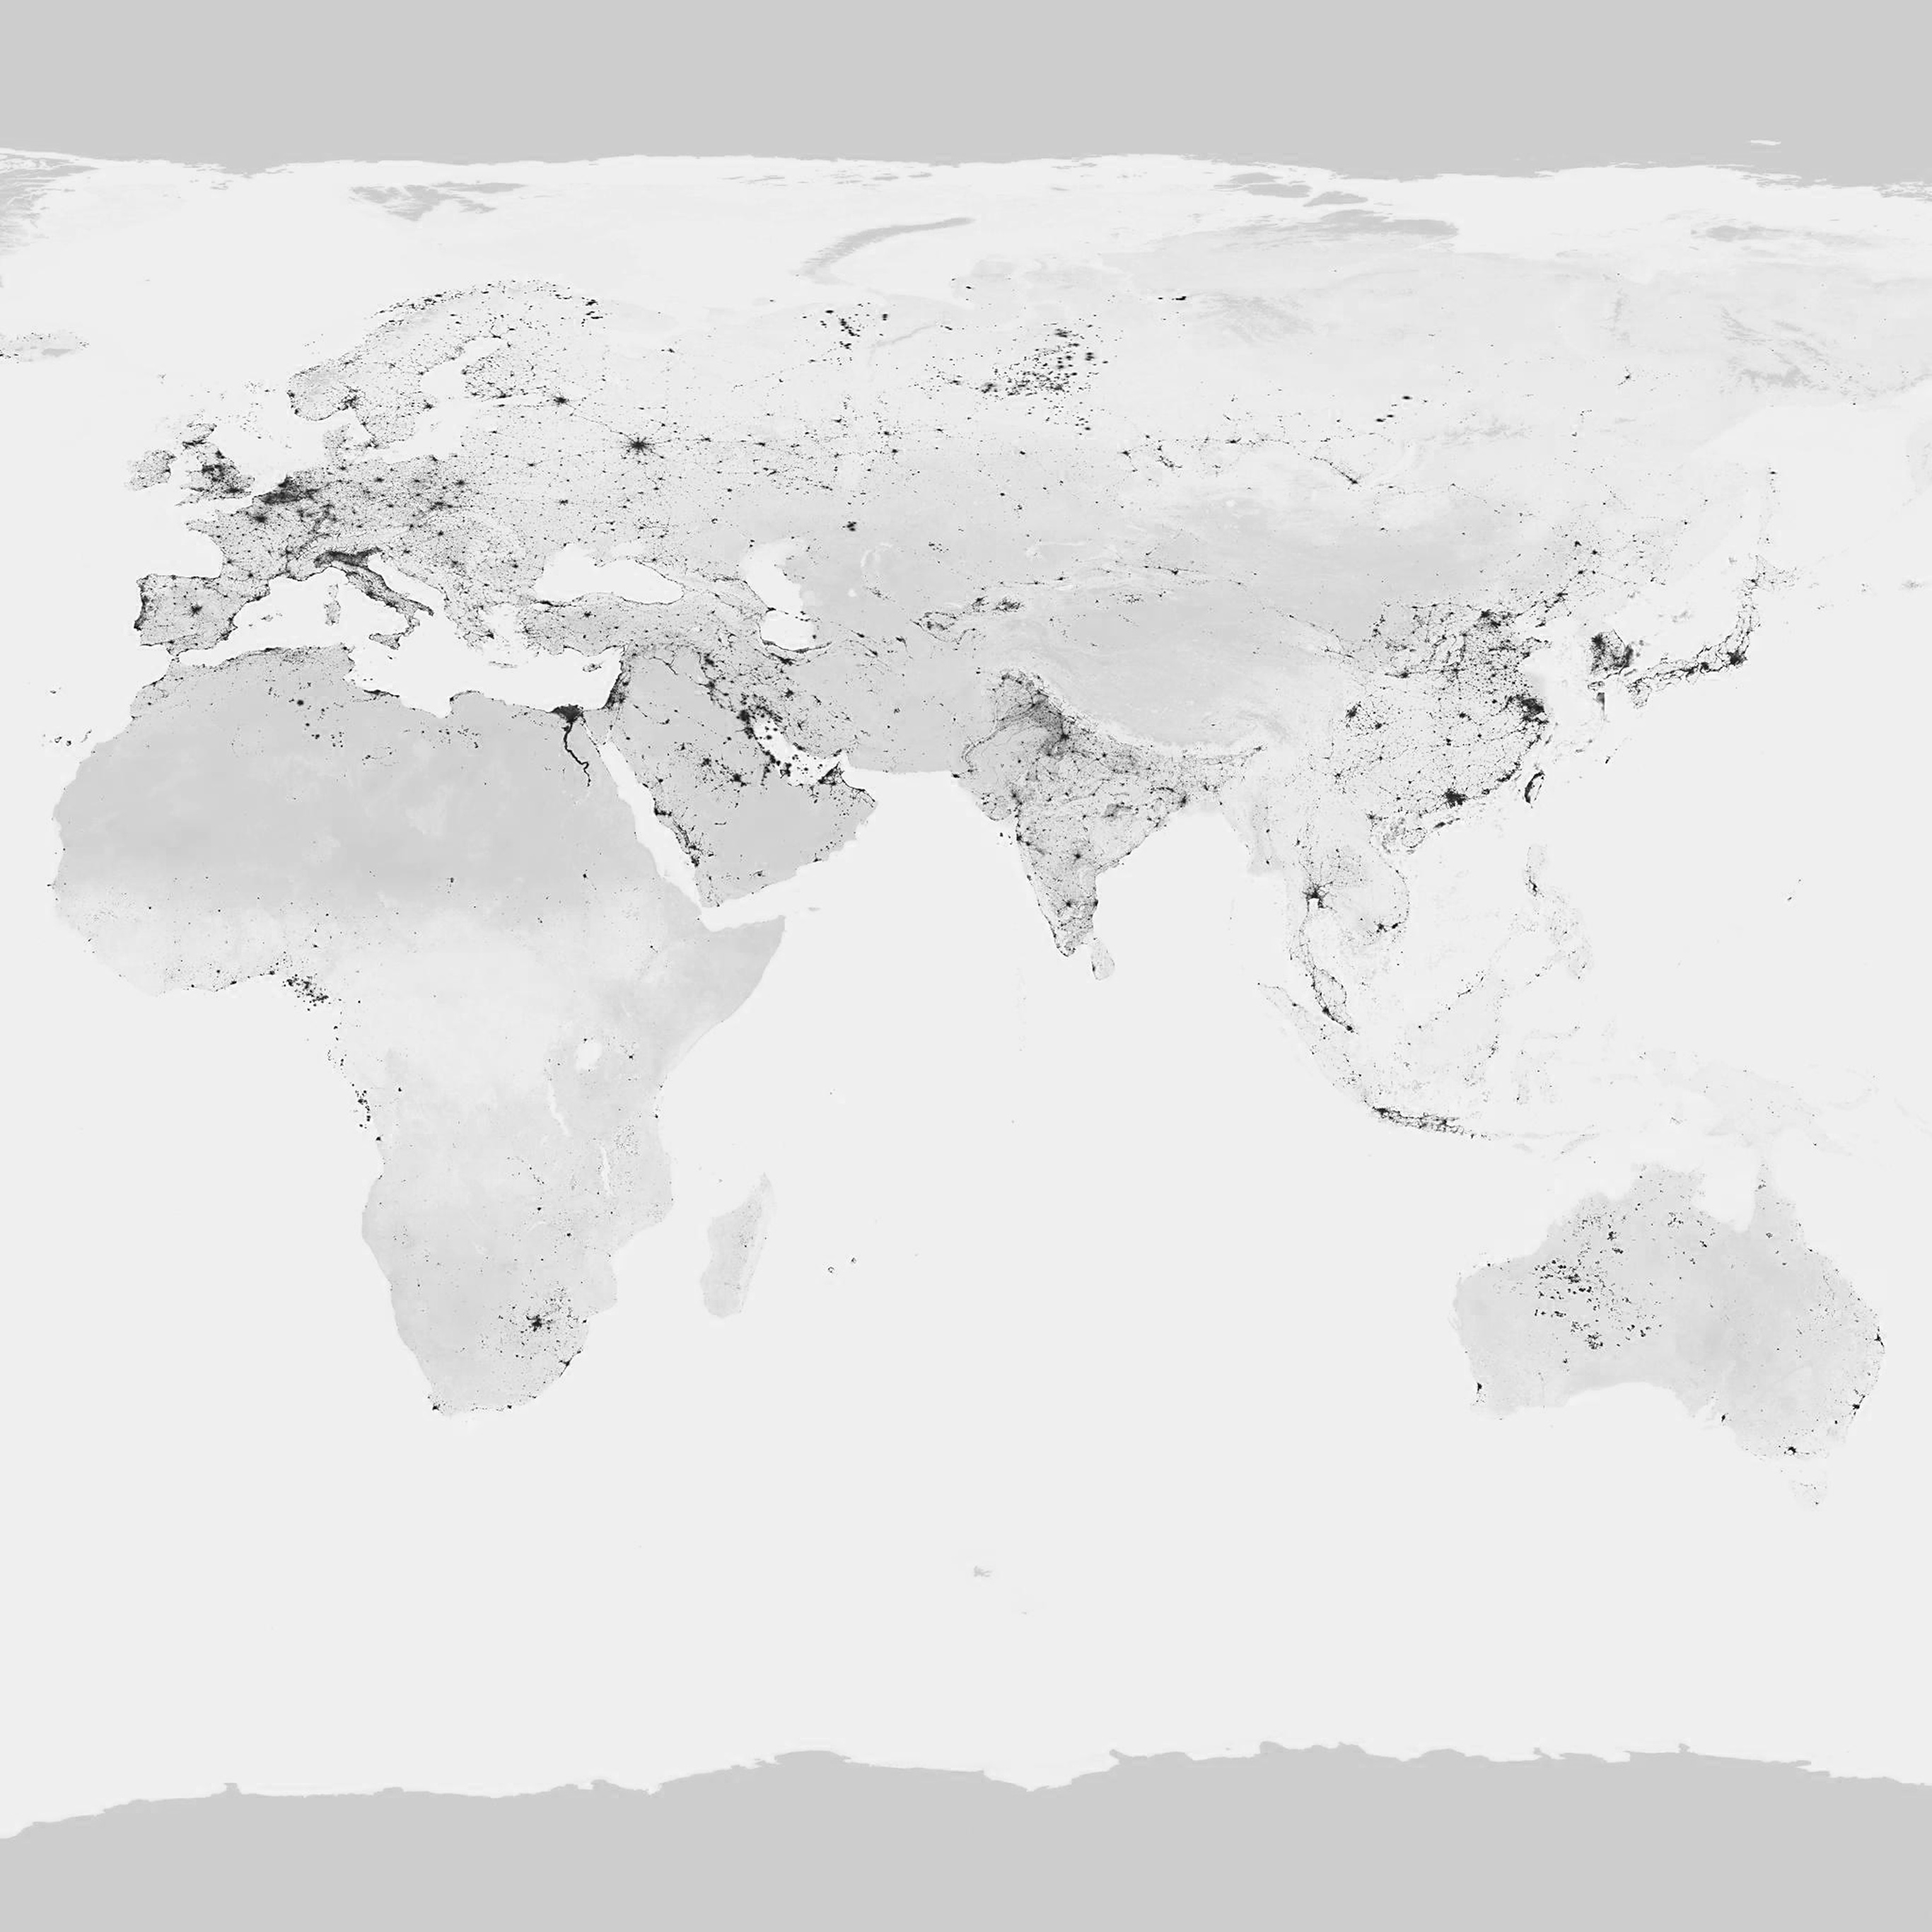 Amworldmapbluewhitegrayearthviewartwallpaper - World map ipad wallpaper